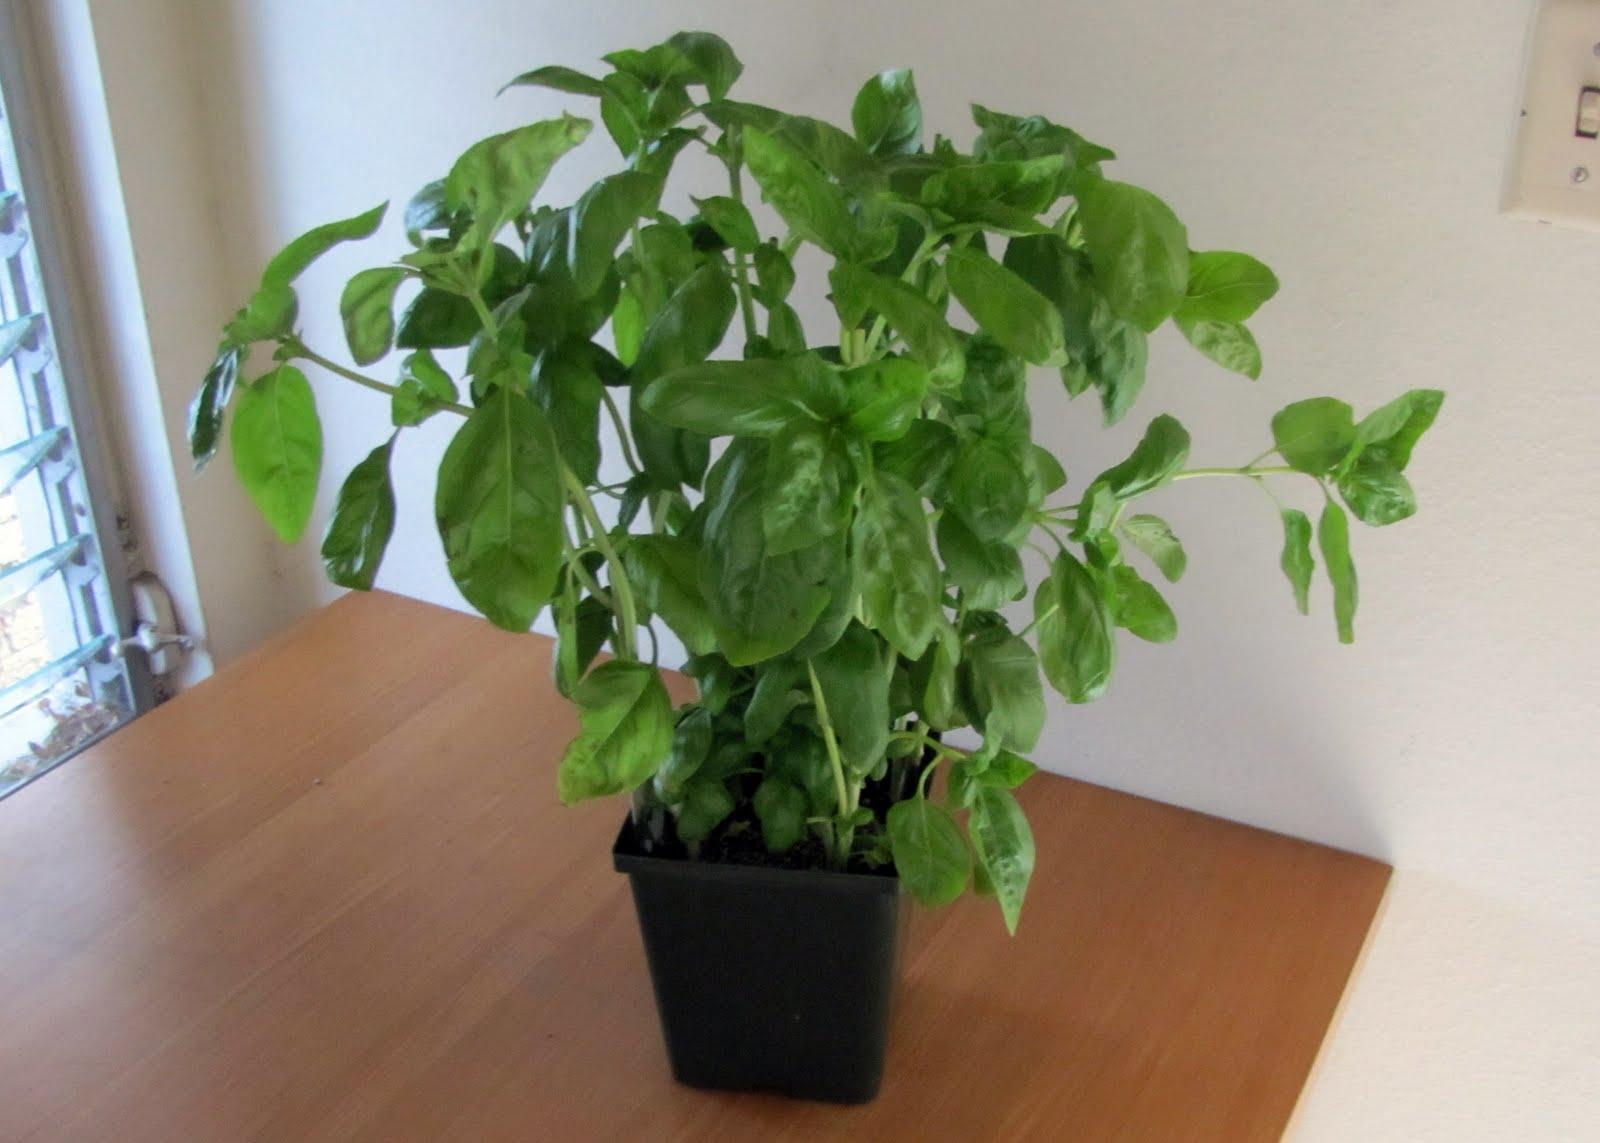 smells like food in here fresh basil plant